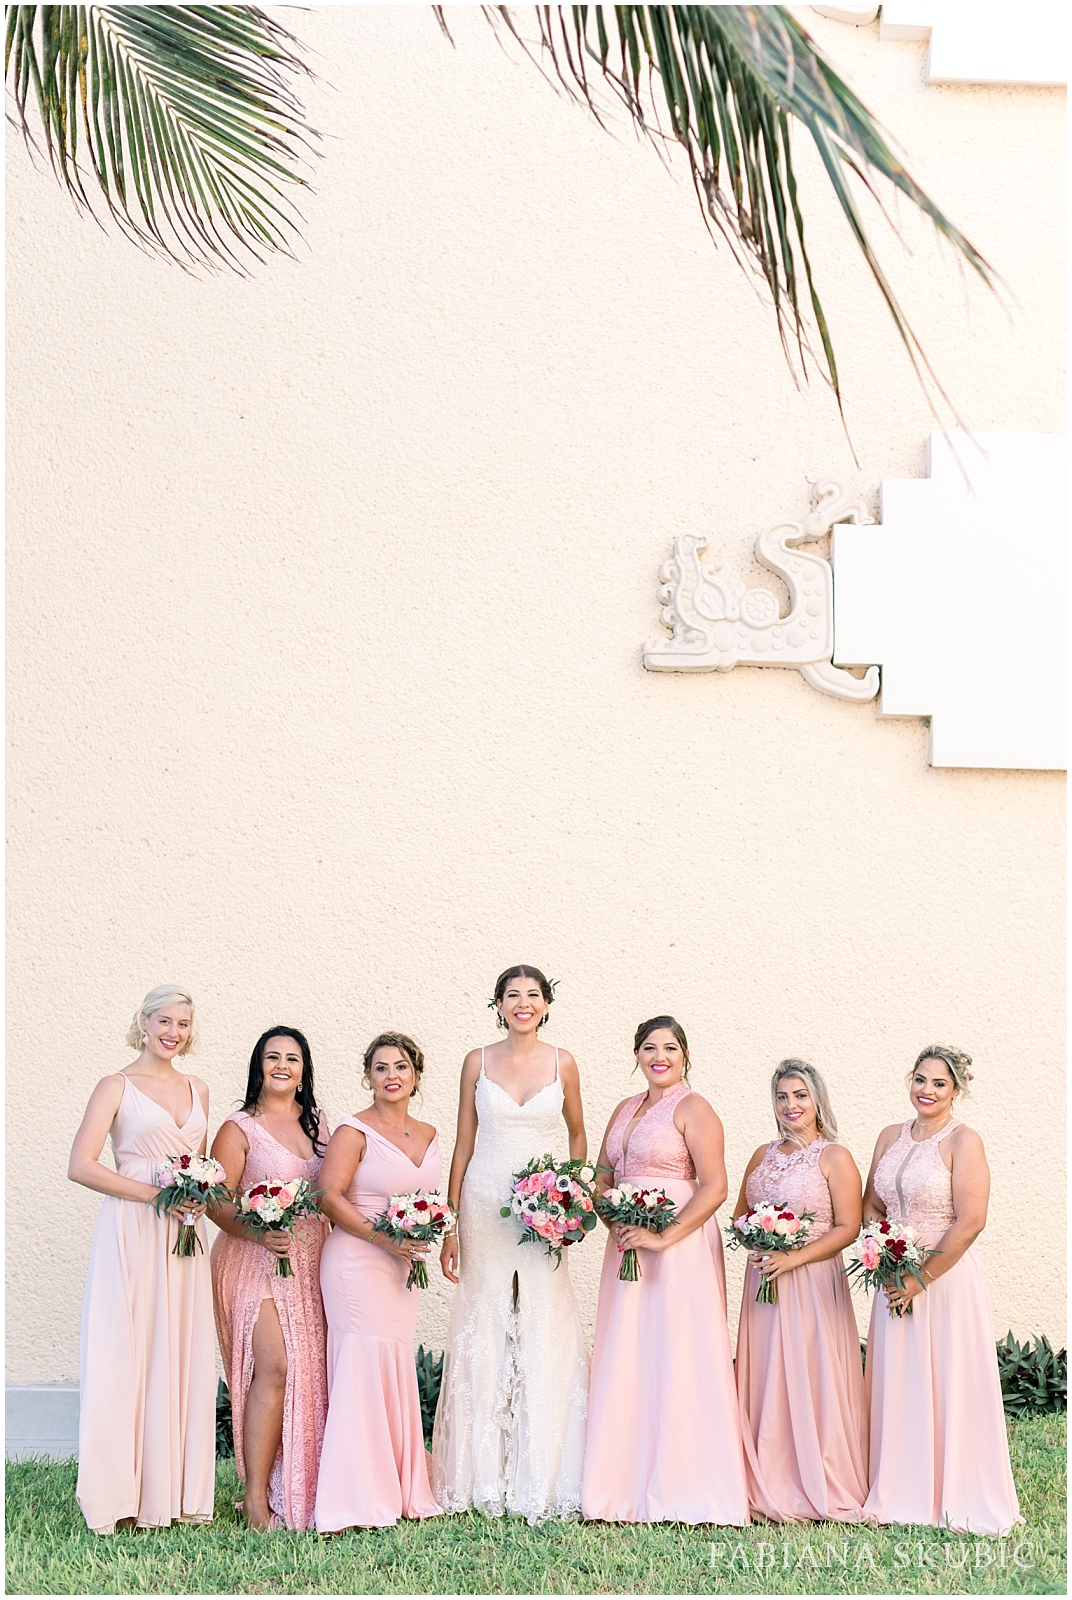 TJ_Now_Sapphire_Riviera_Cancun_Mexico_Wedding_Photos_0213.jpg